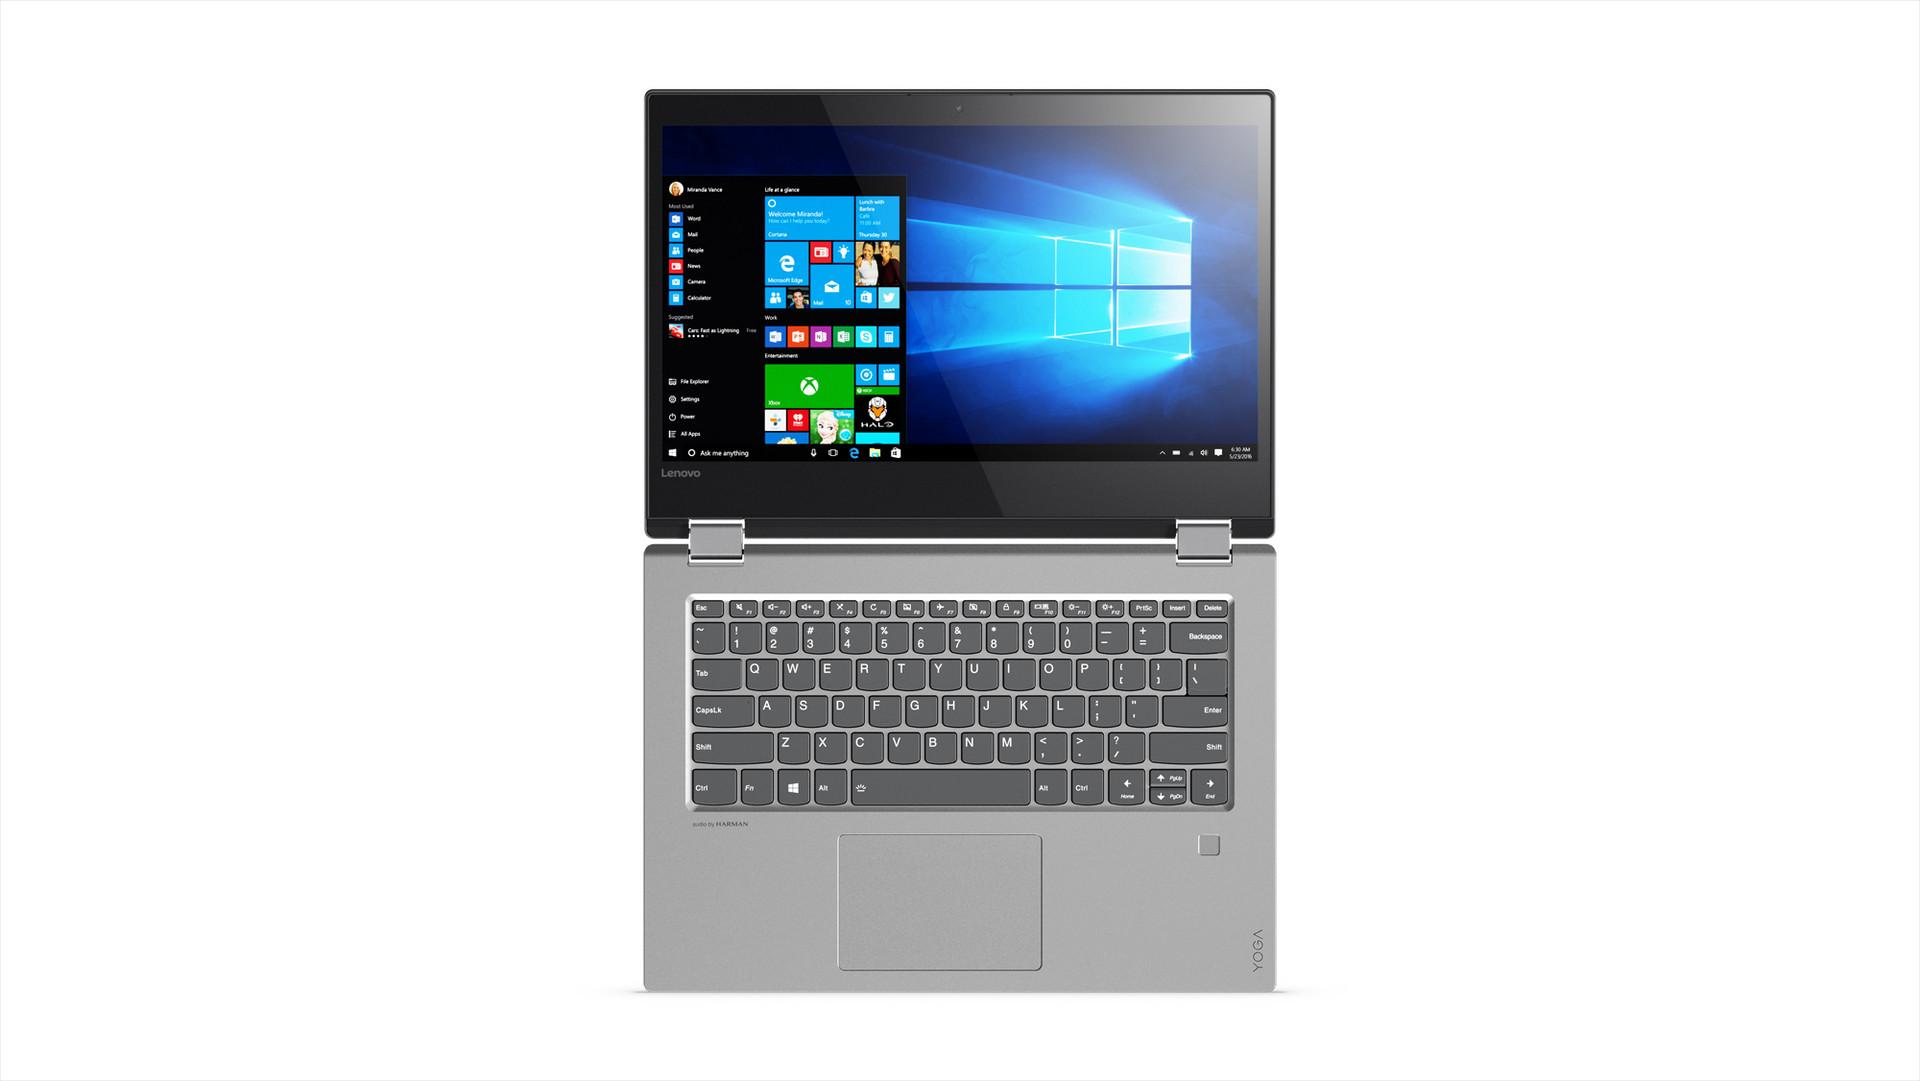 Lenovo Yoga 520 And Yoga 720 Convertible Notebooks Now